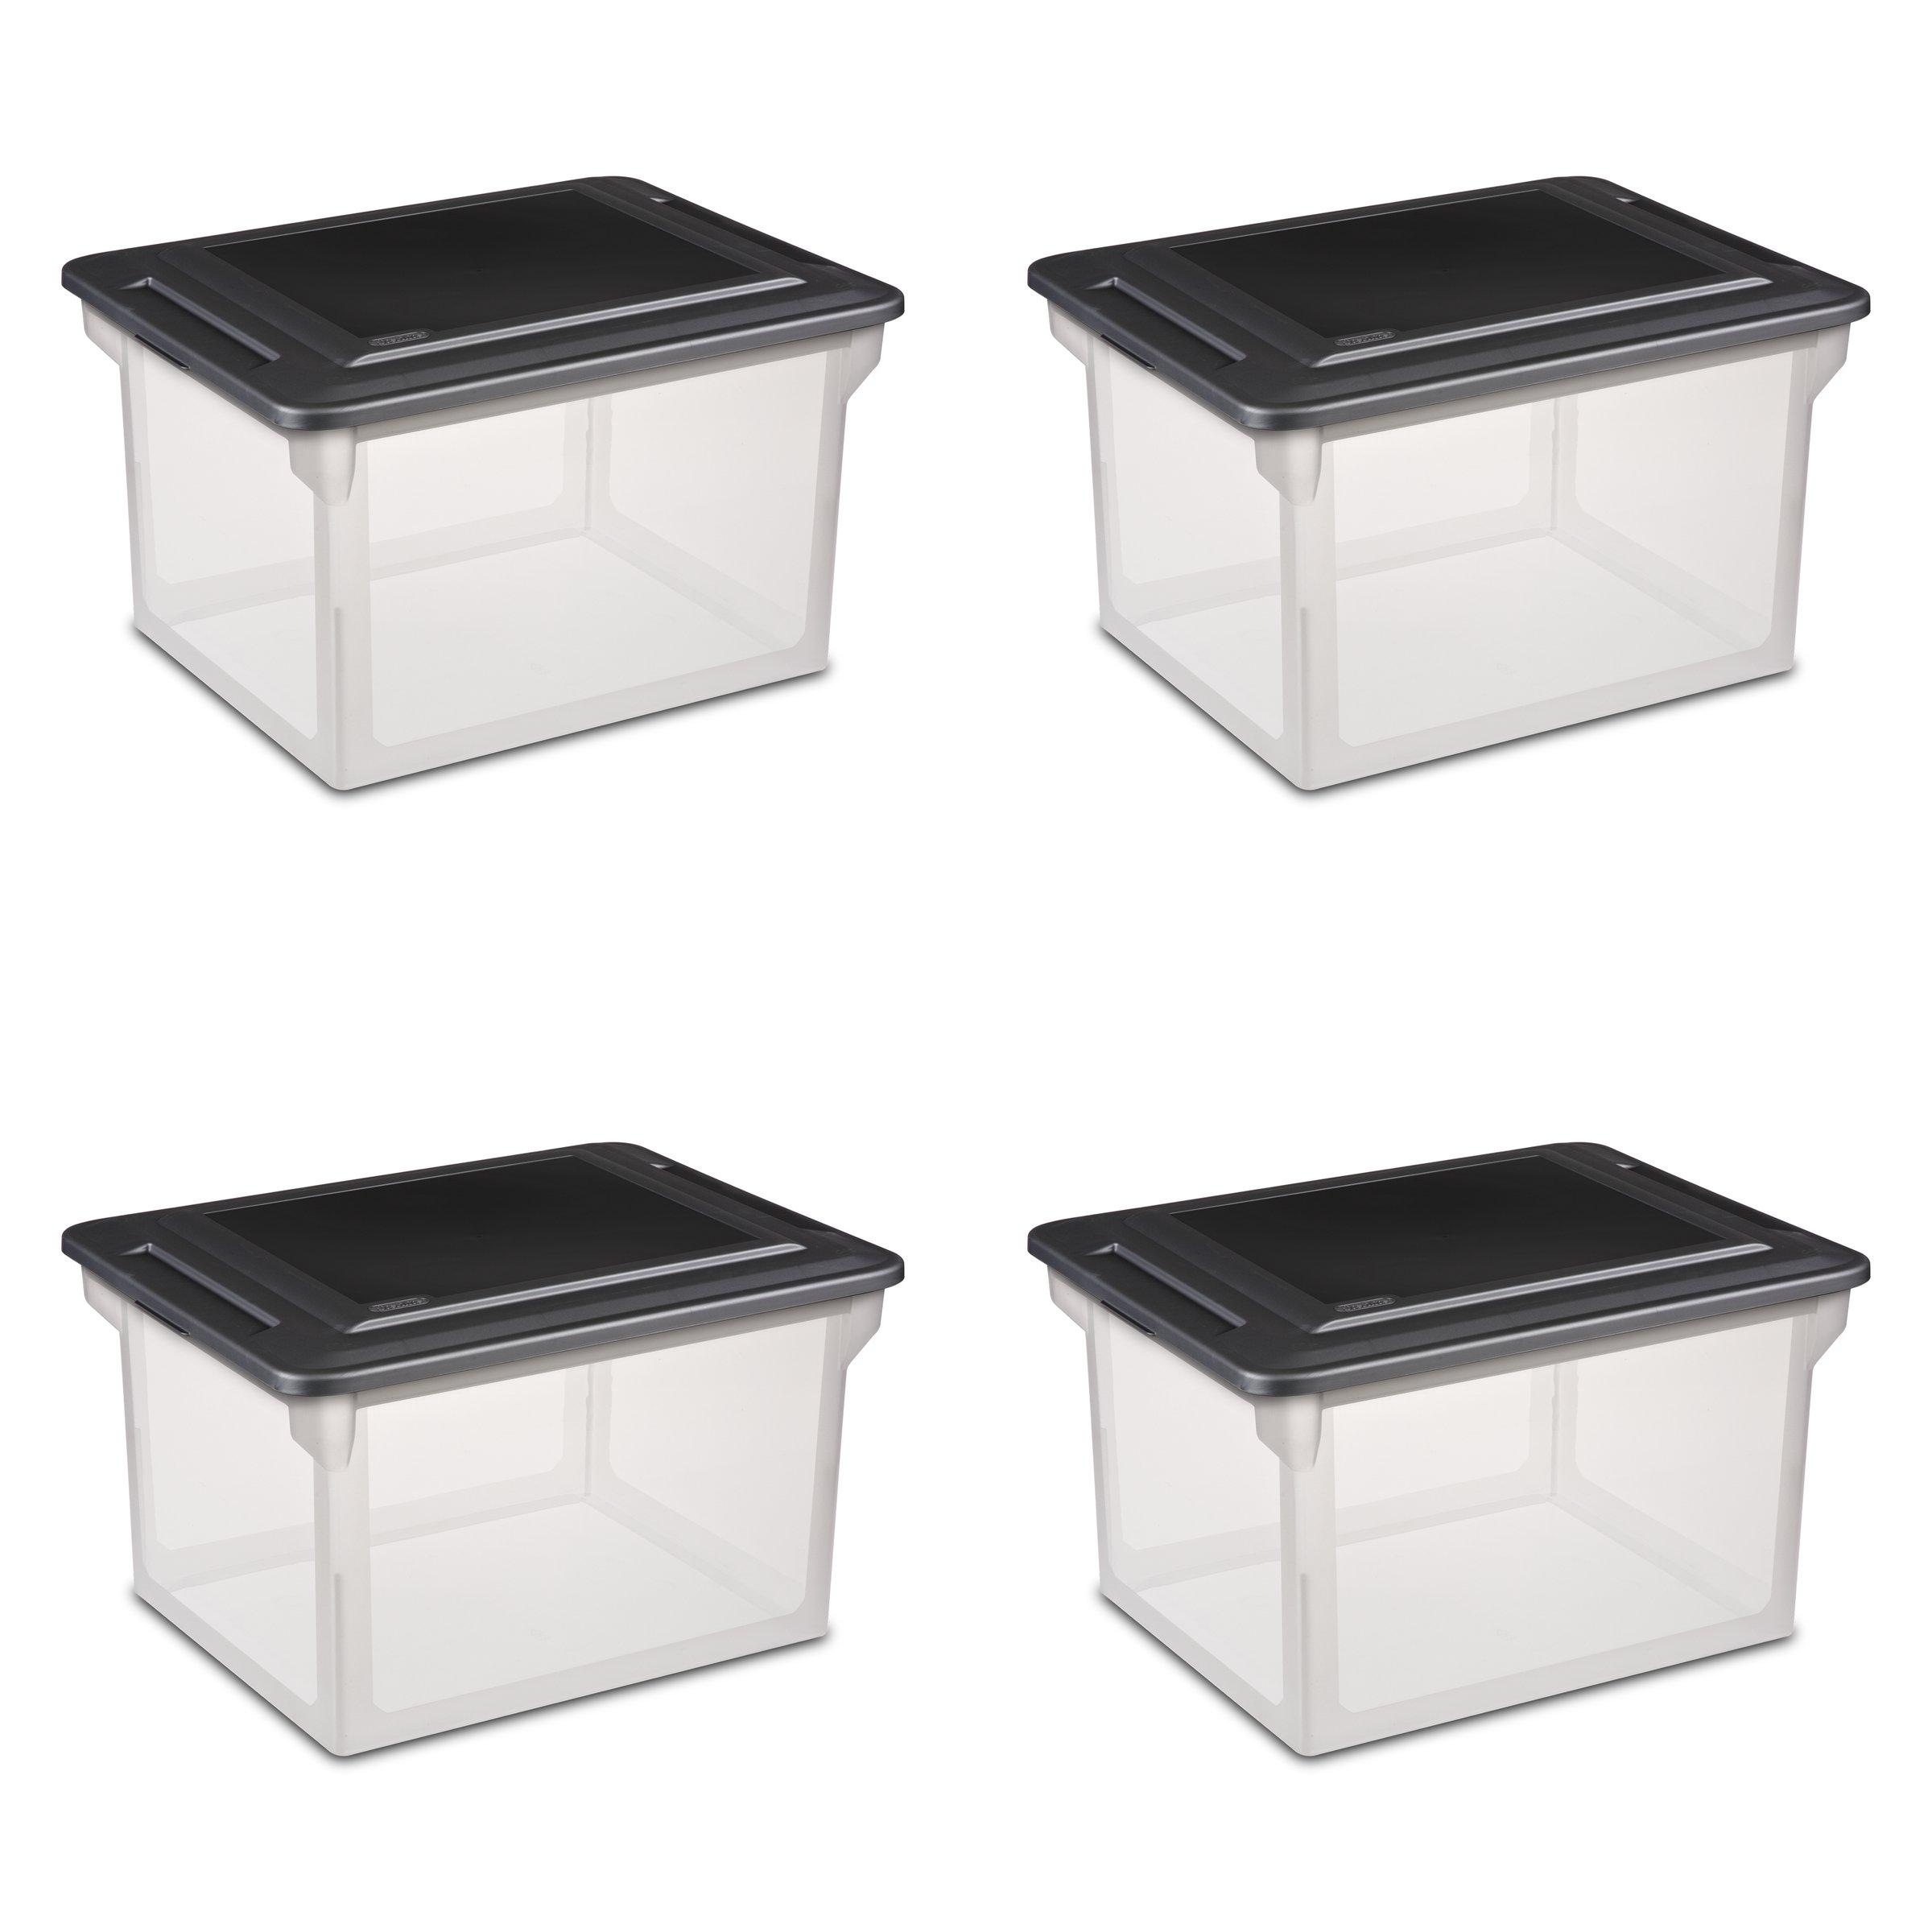 Sterilite 18689004  Storage File Box, 4-Pack by STERILITE